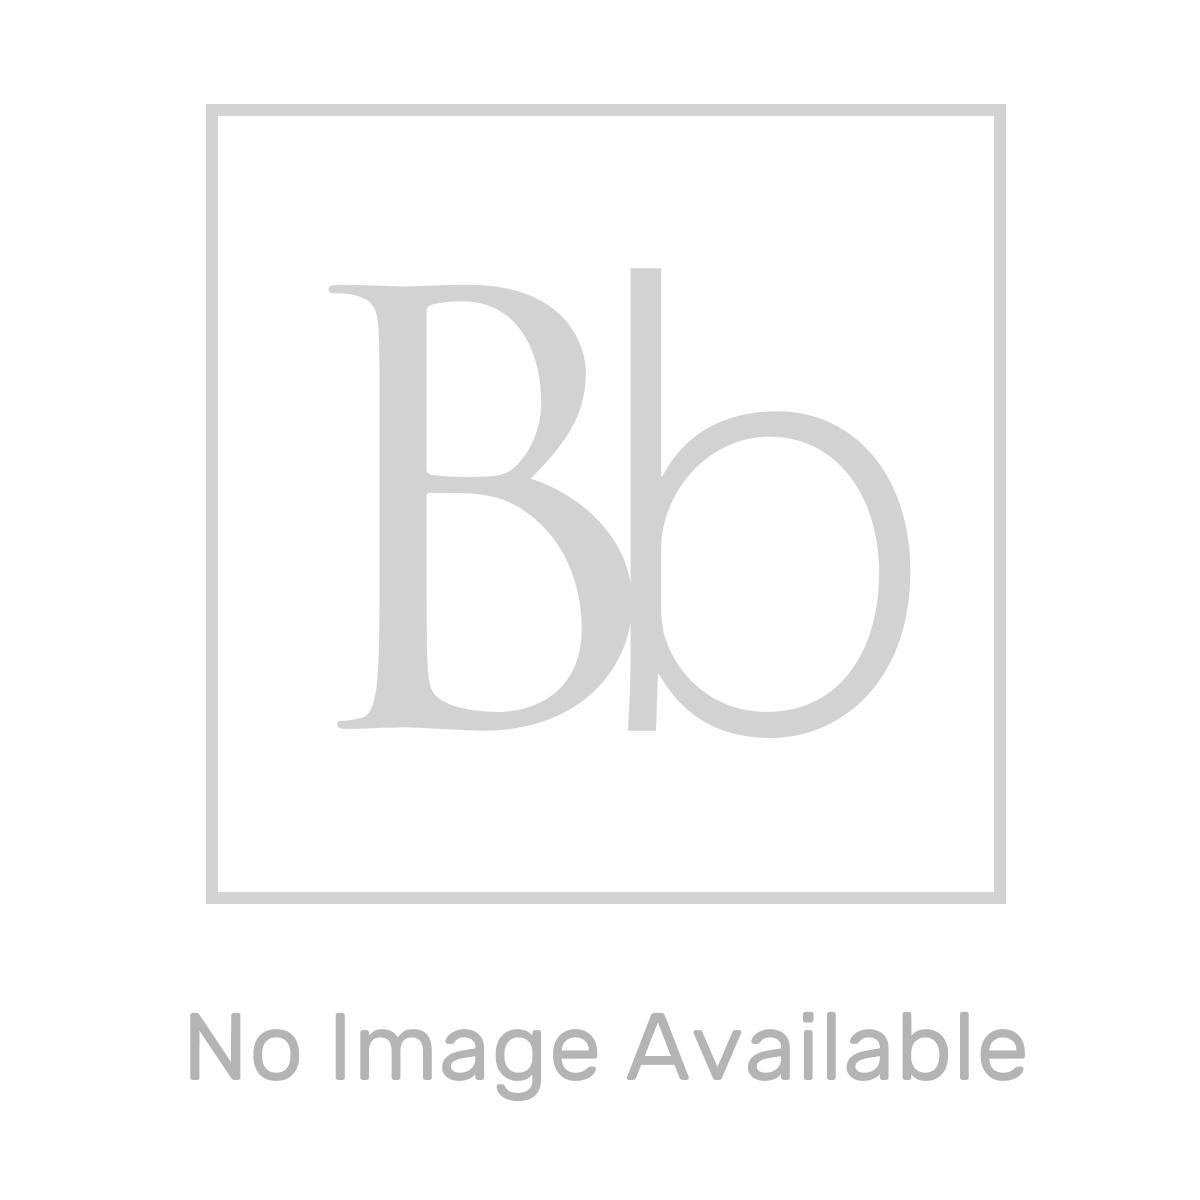 RAK Sensation Gloss White 1 Tap Hole Wall Hung Basin 600mm